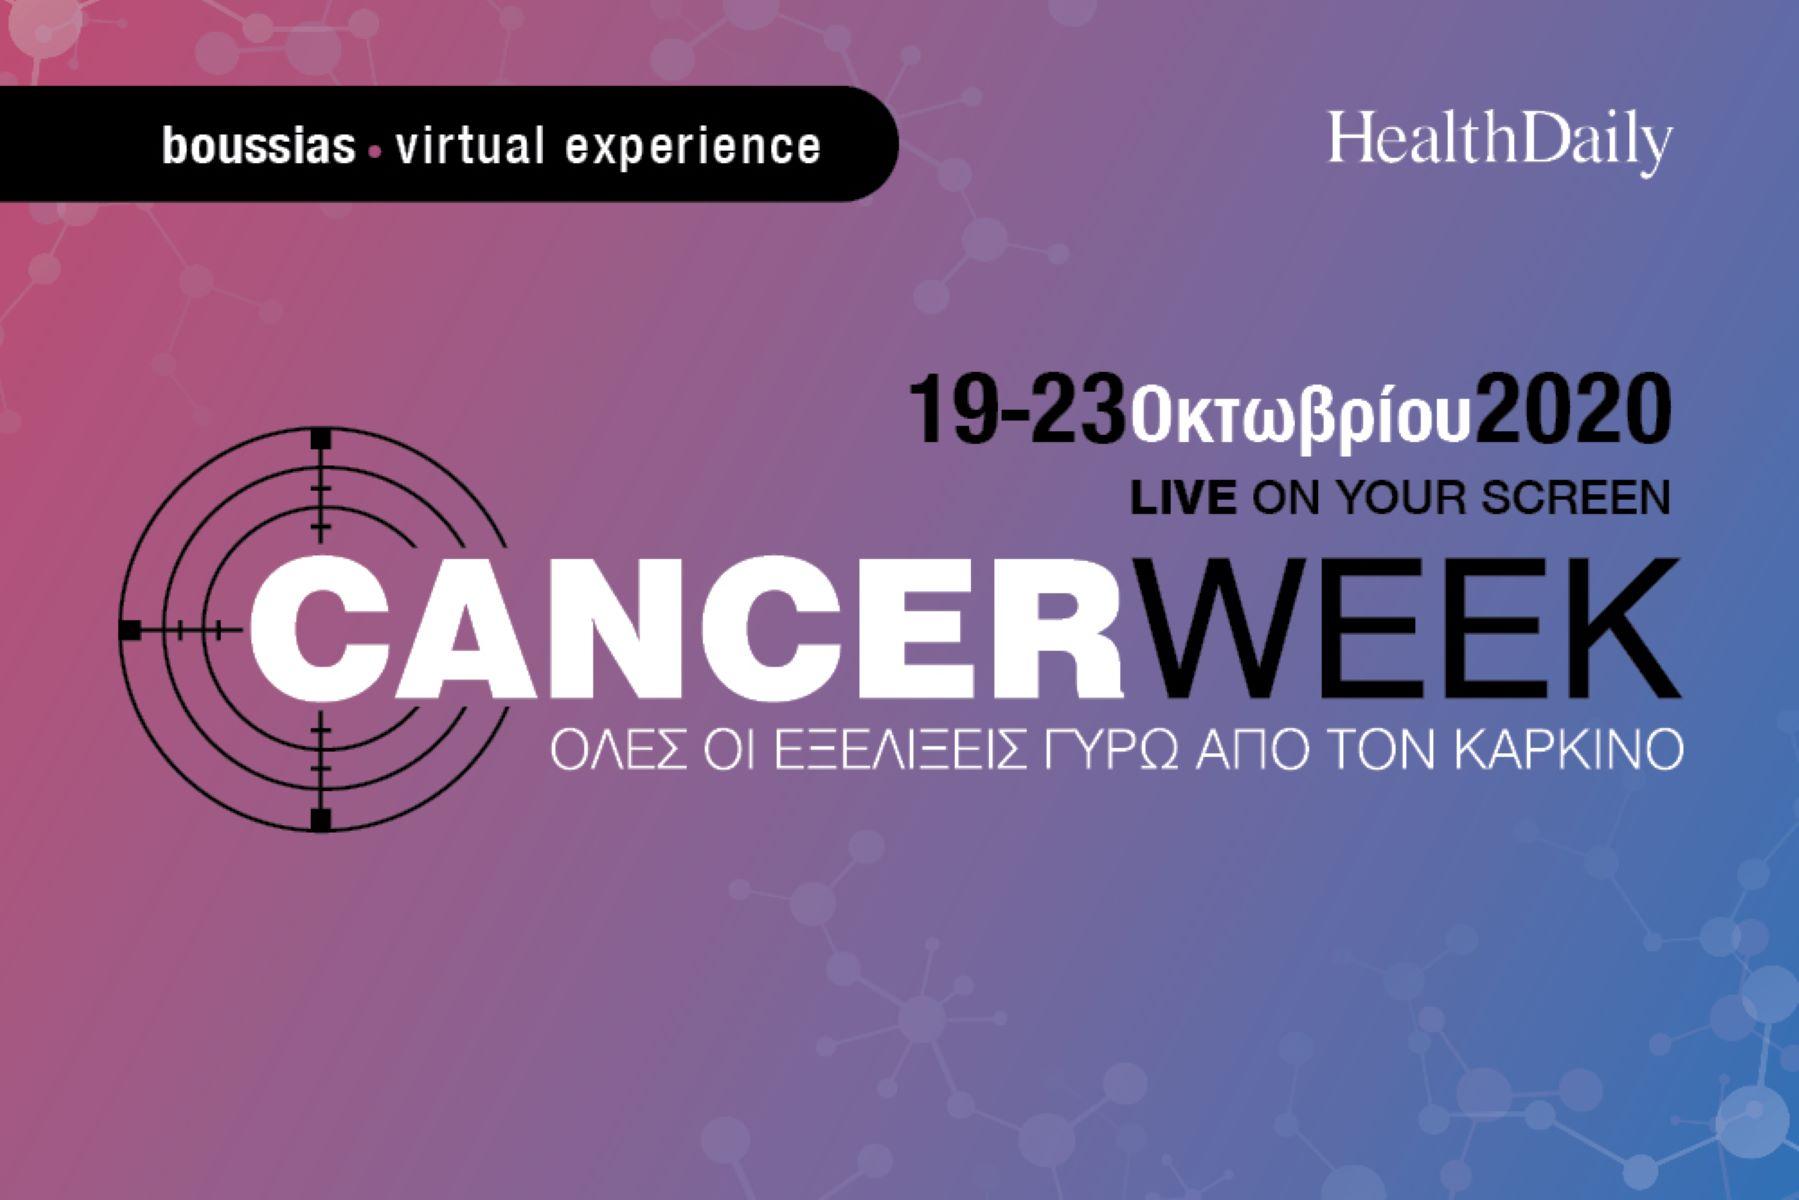 Cancer week boussias: Μία εβδομάδα αφιερωμένη στη μάχη κατά του καρκίνου